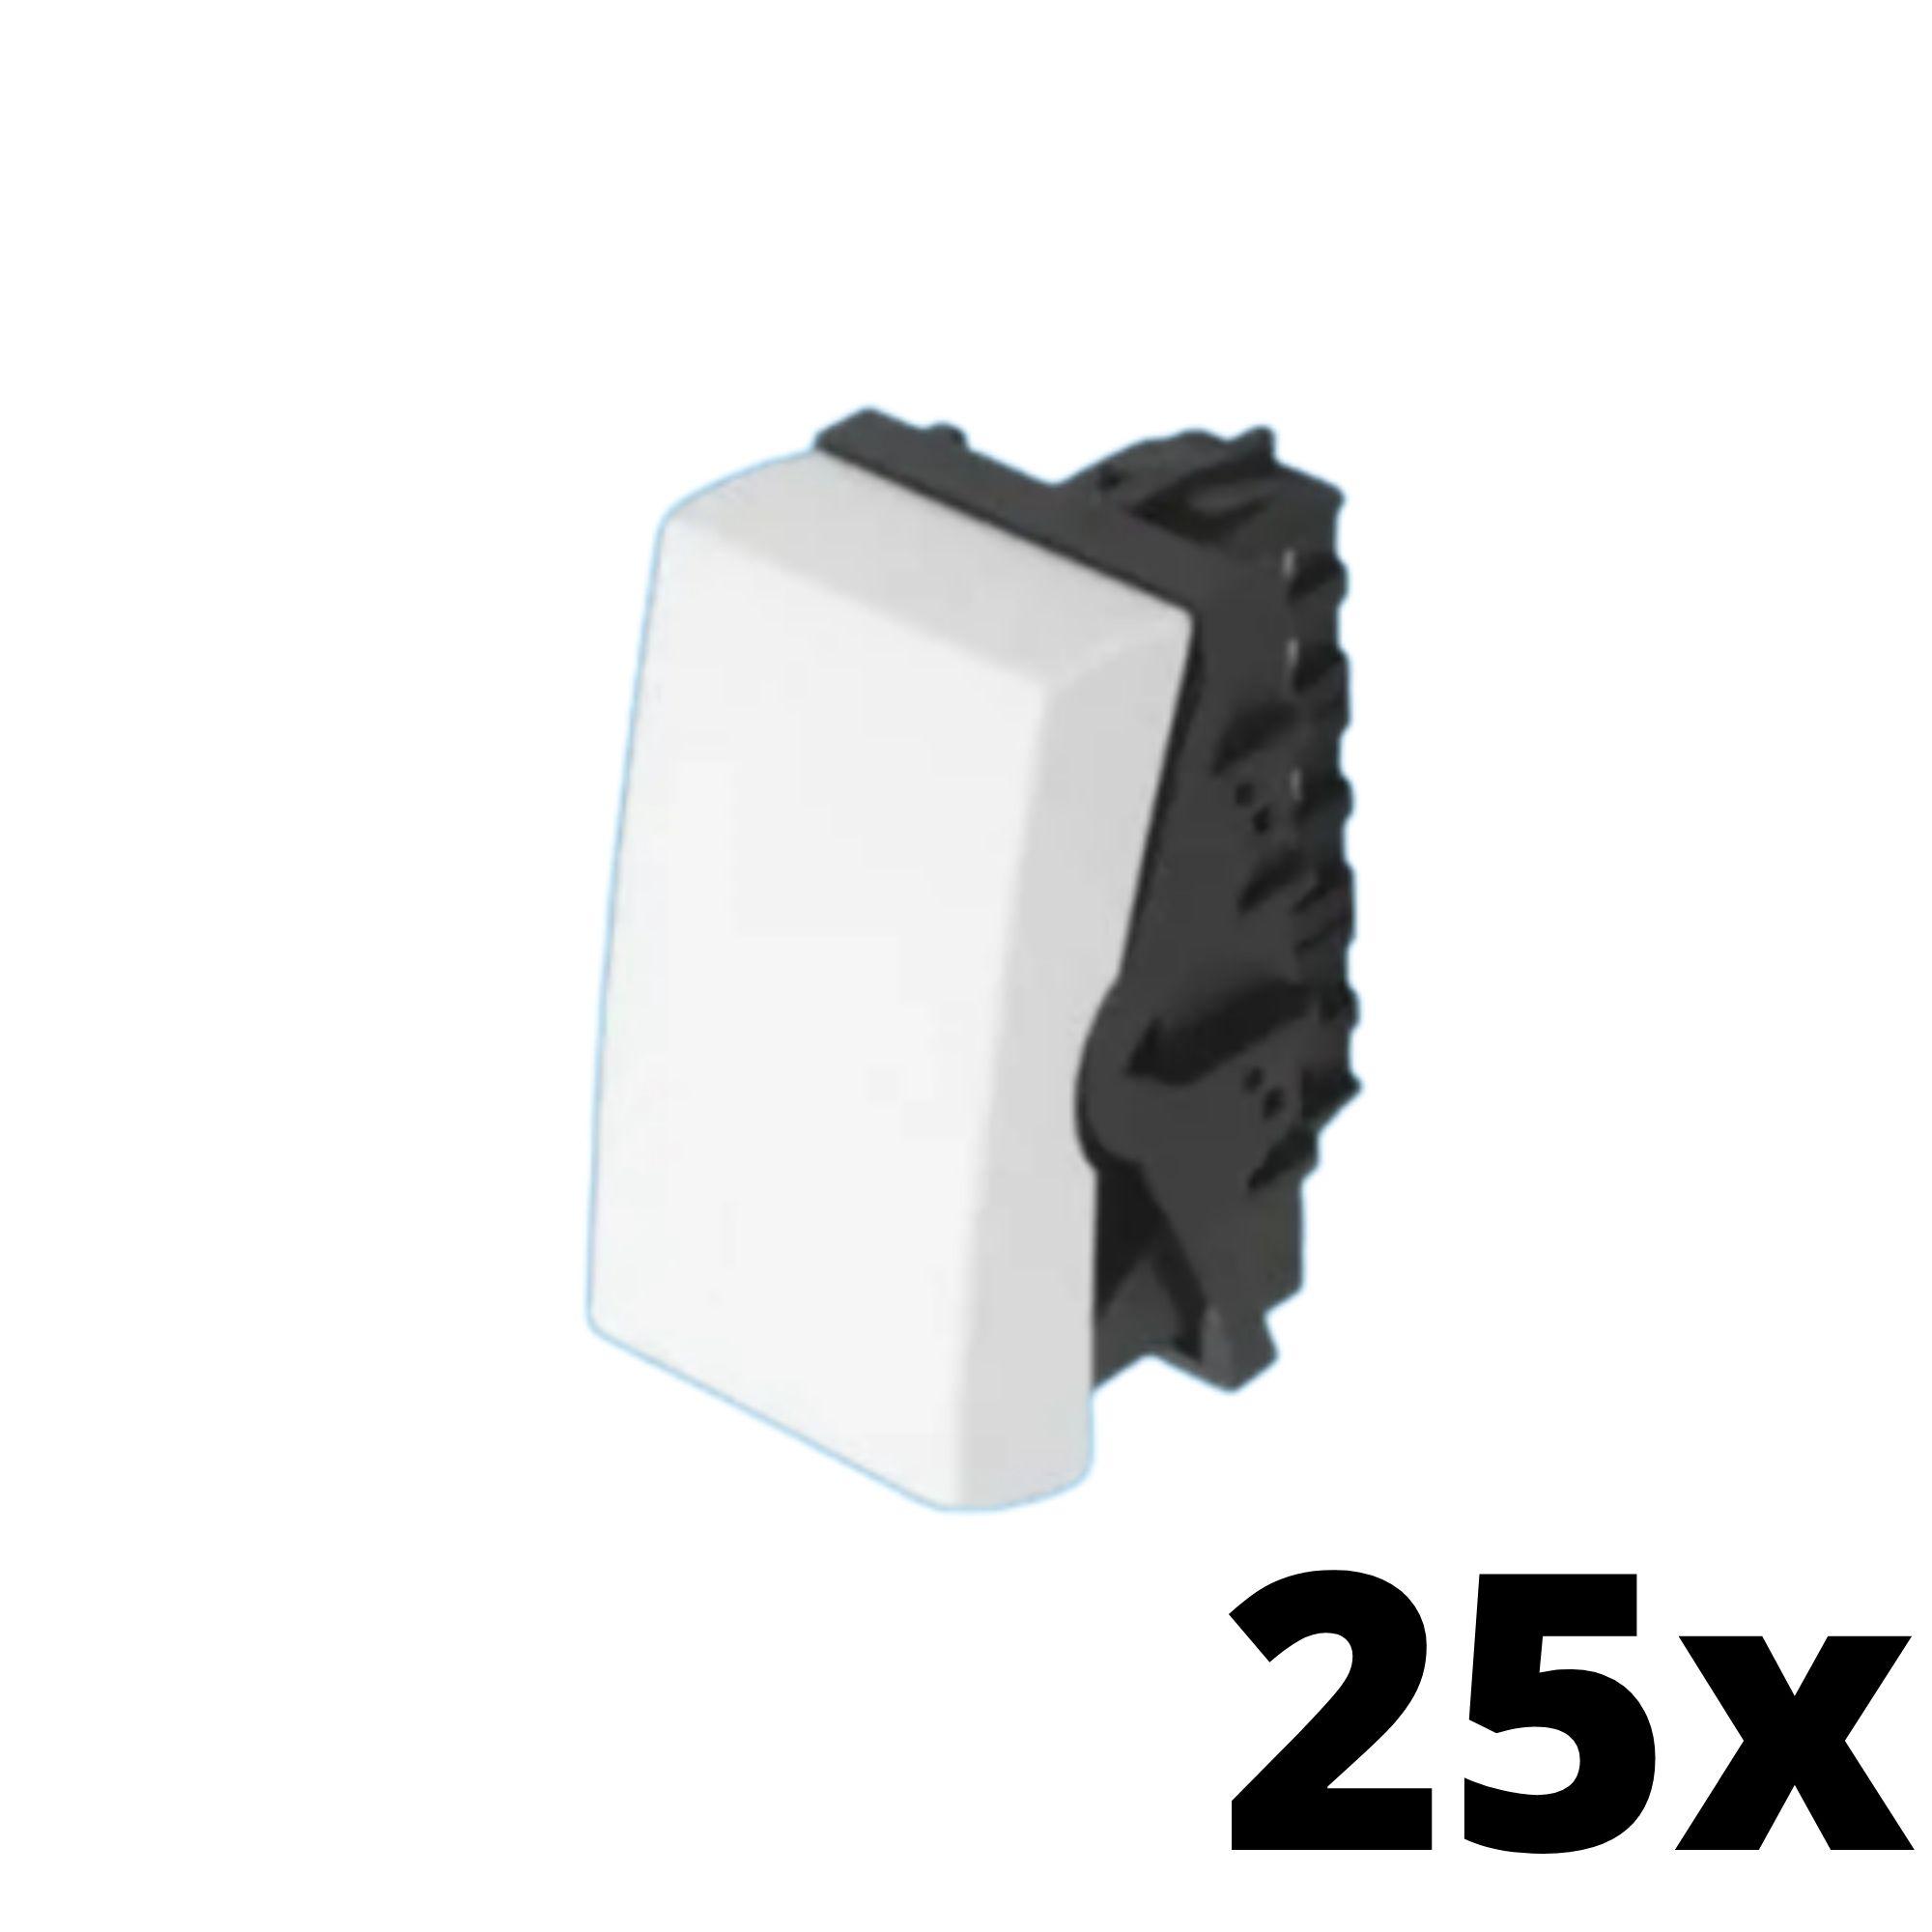 Kit 25 und Evidence Módulo de Interruptor Simples